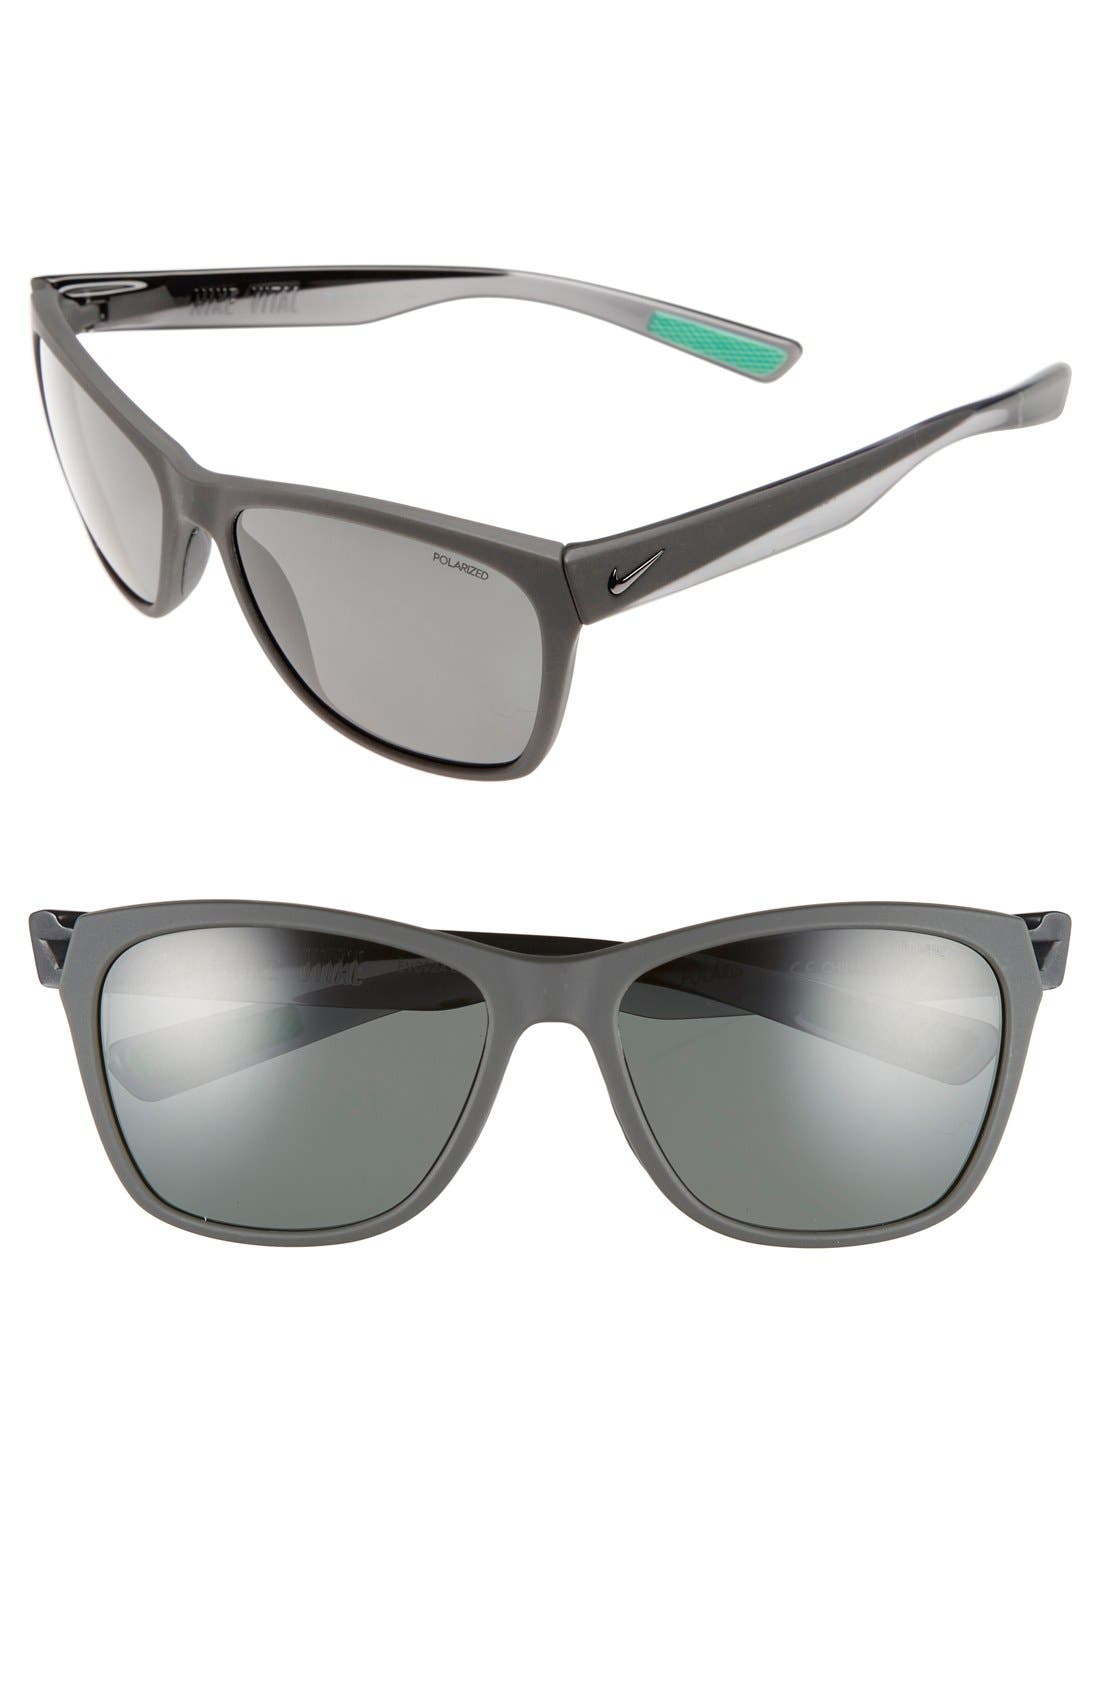 nike glasses womens price